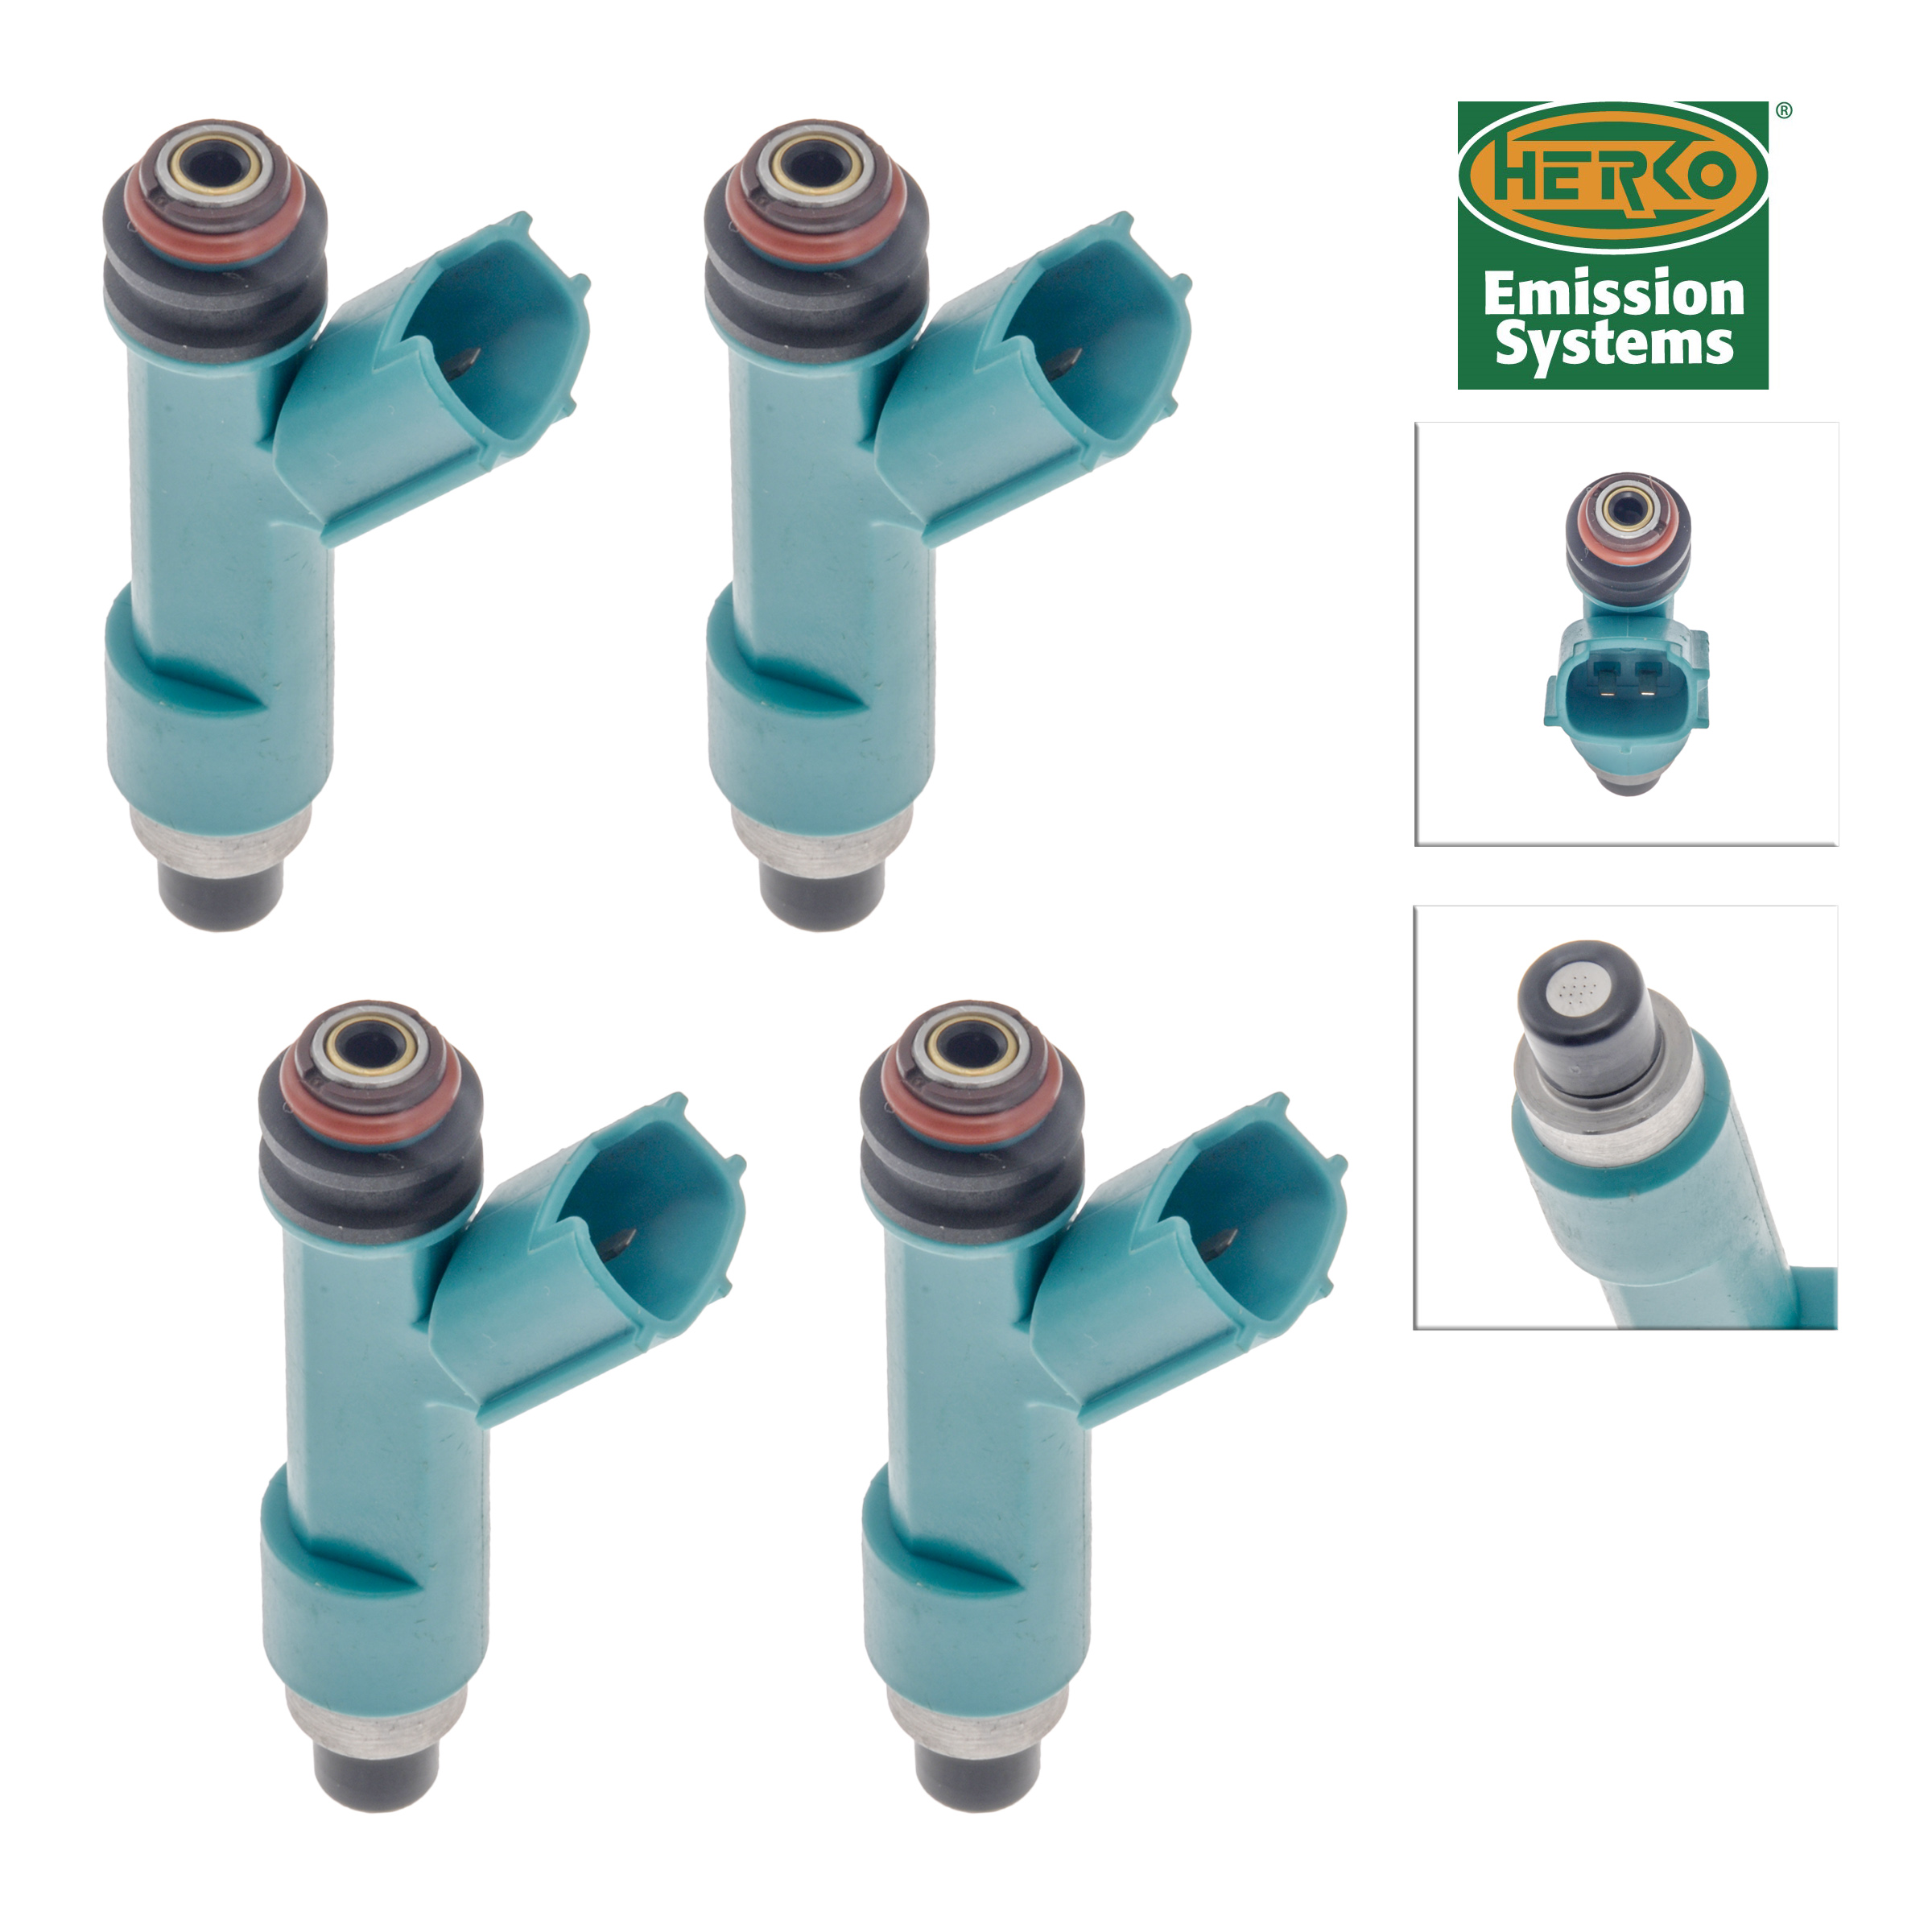 Set of 4 Herko Fuel Injector INJ535 For Toyota Scion Camry Matrix Corolla 04-15